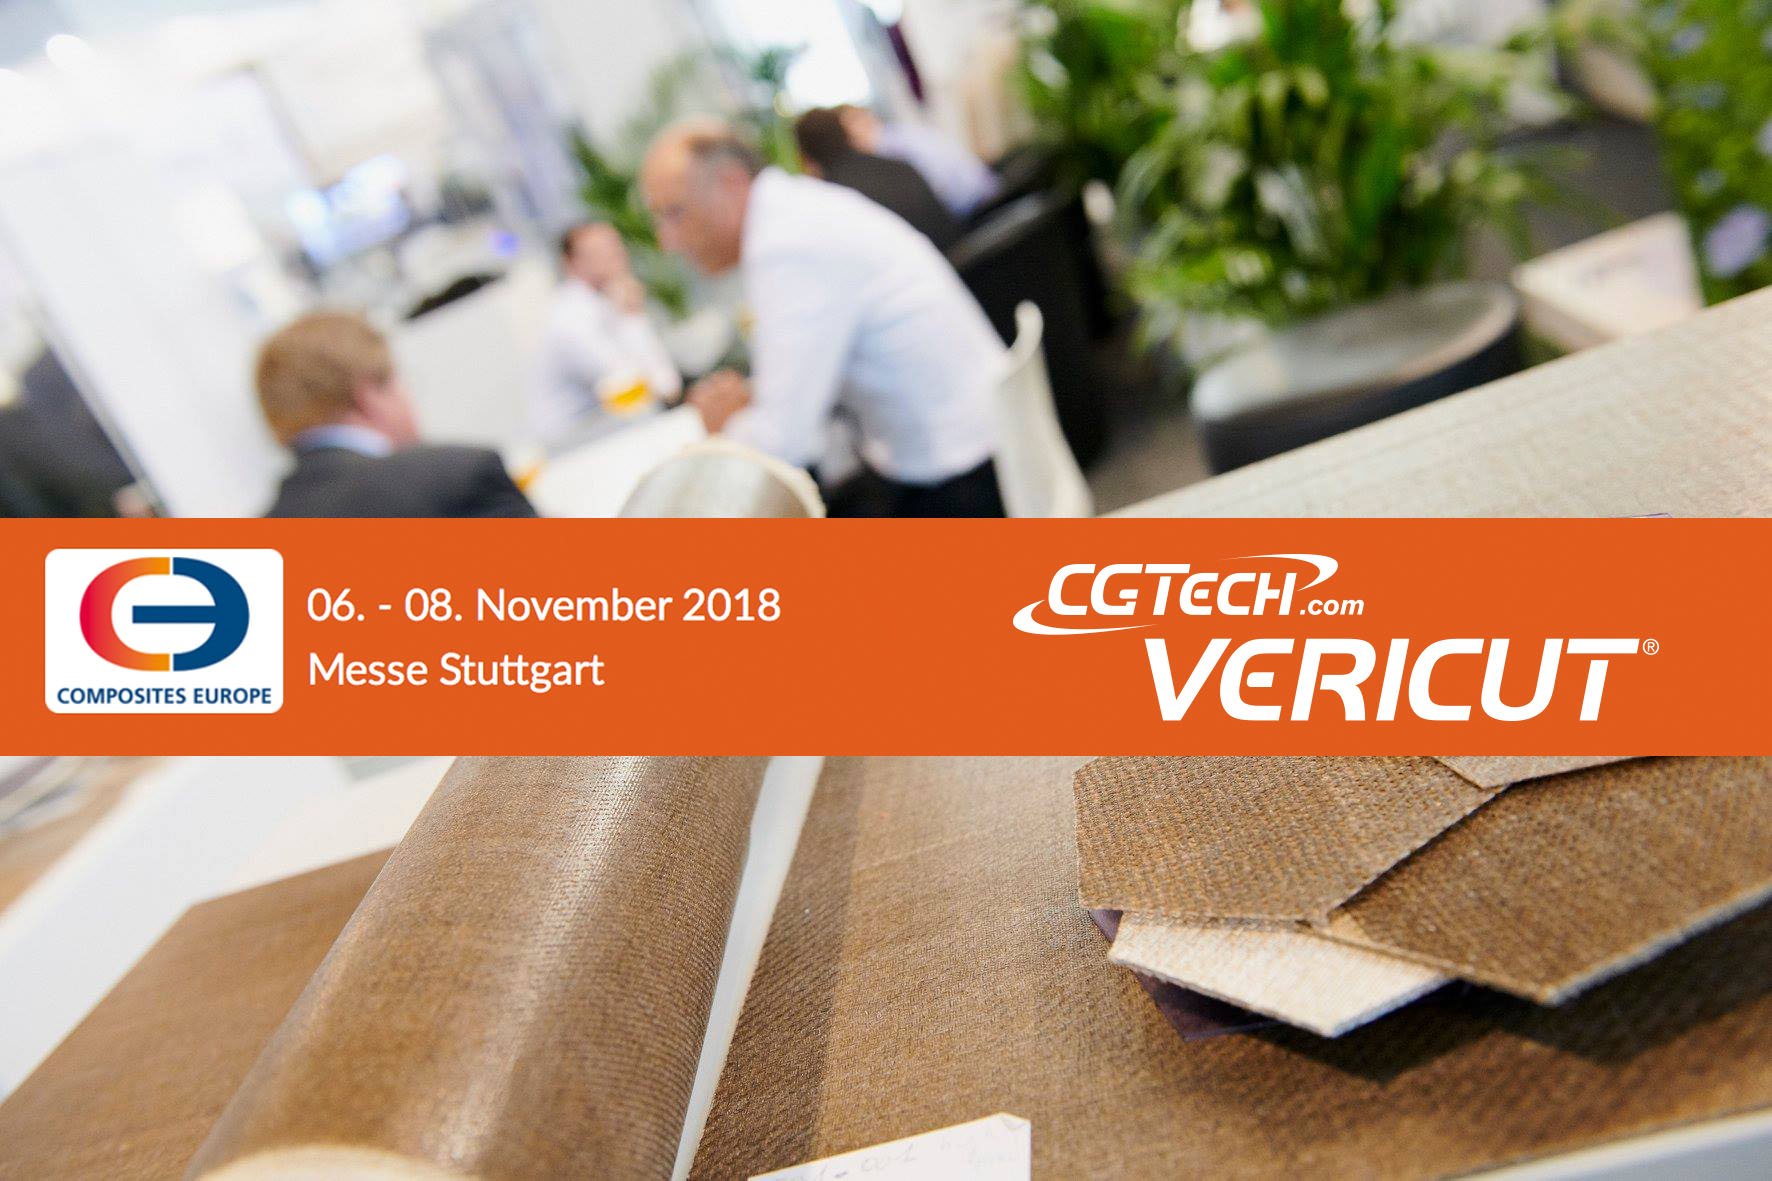 Salon Composites Europe de Stuttgart avec CGTech